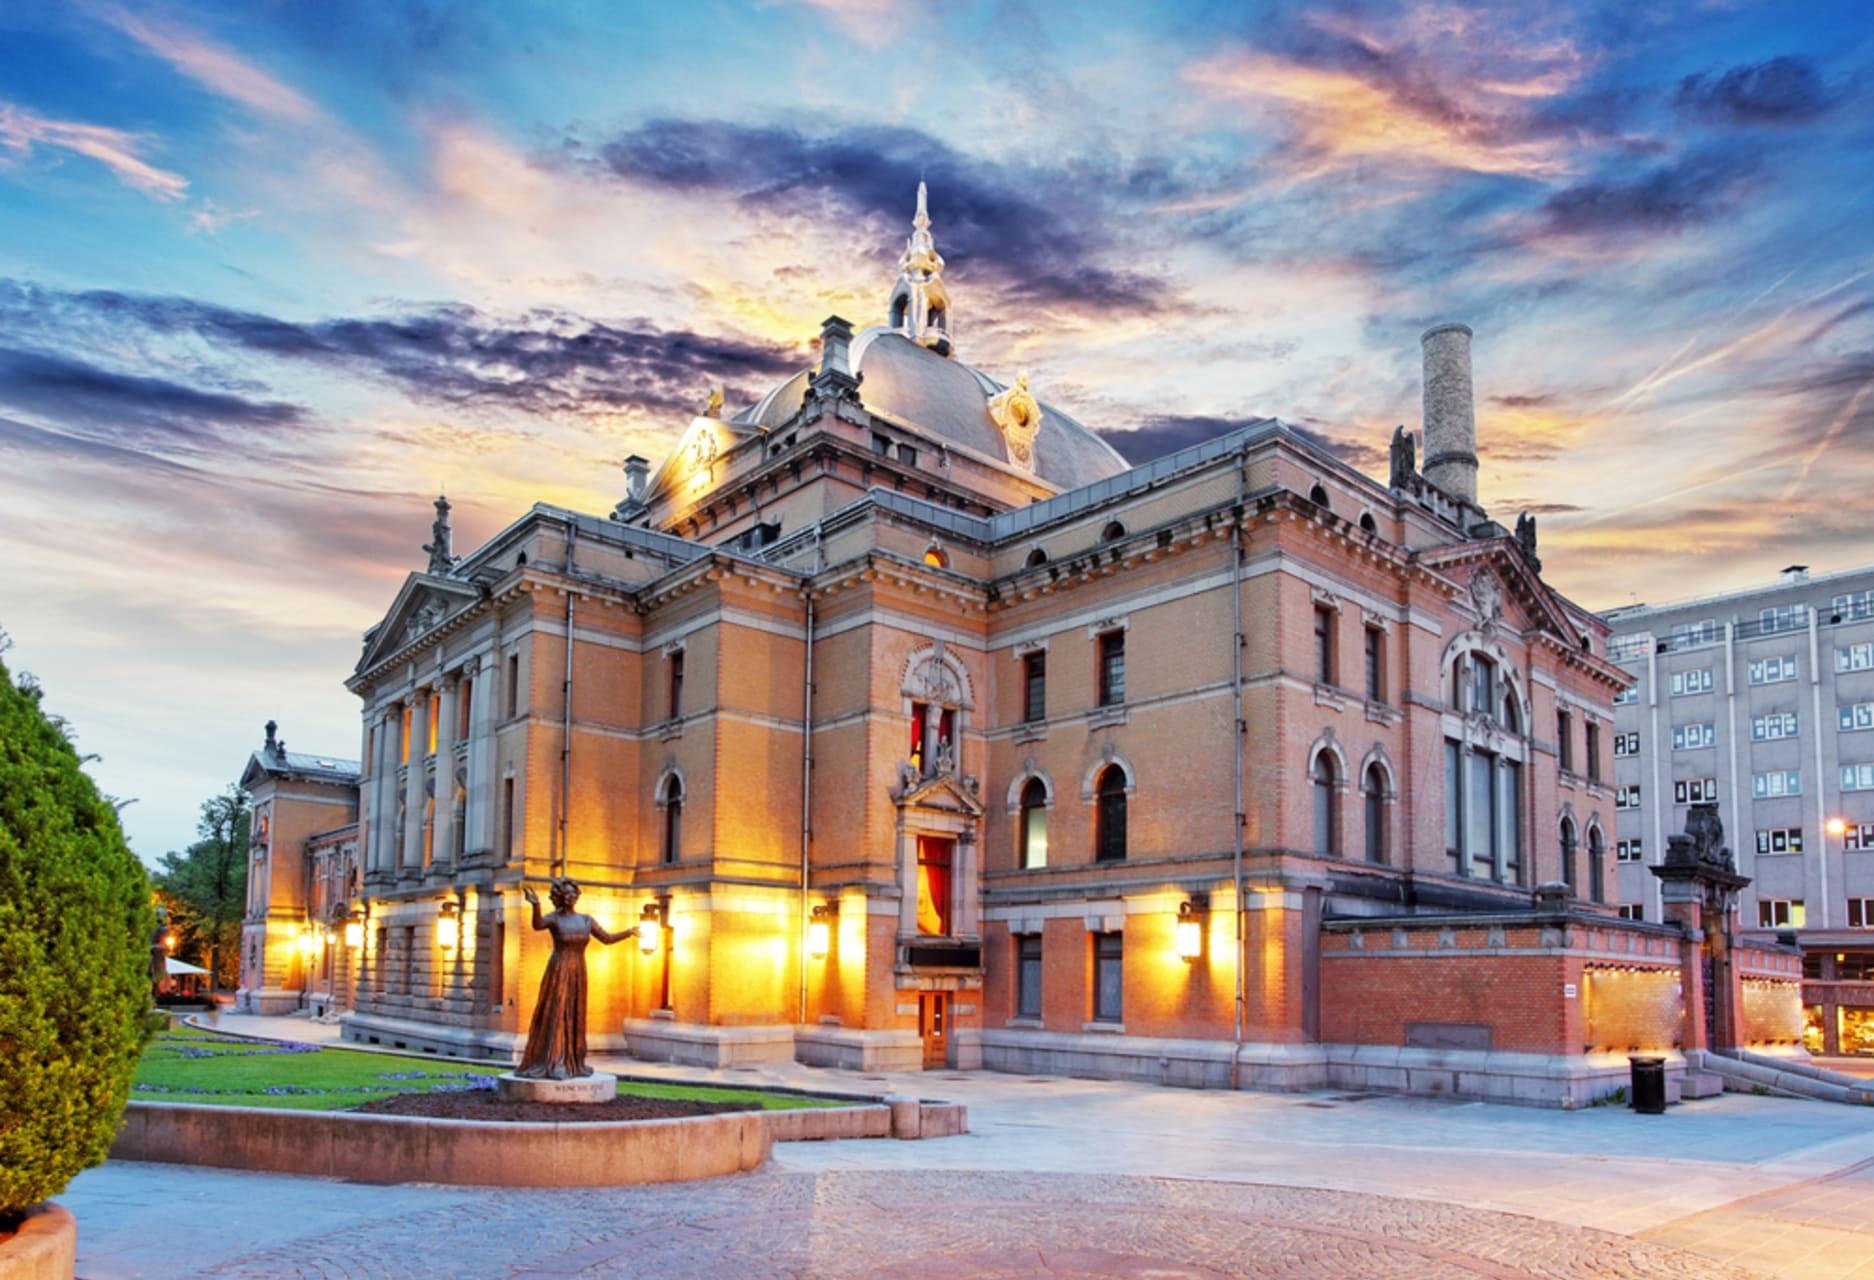 Oslo - Oslo Centre: The Essence of the Norwegian Capital